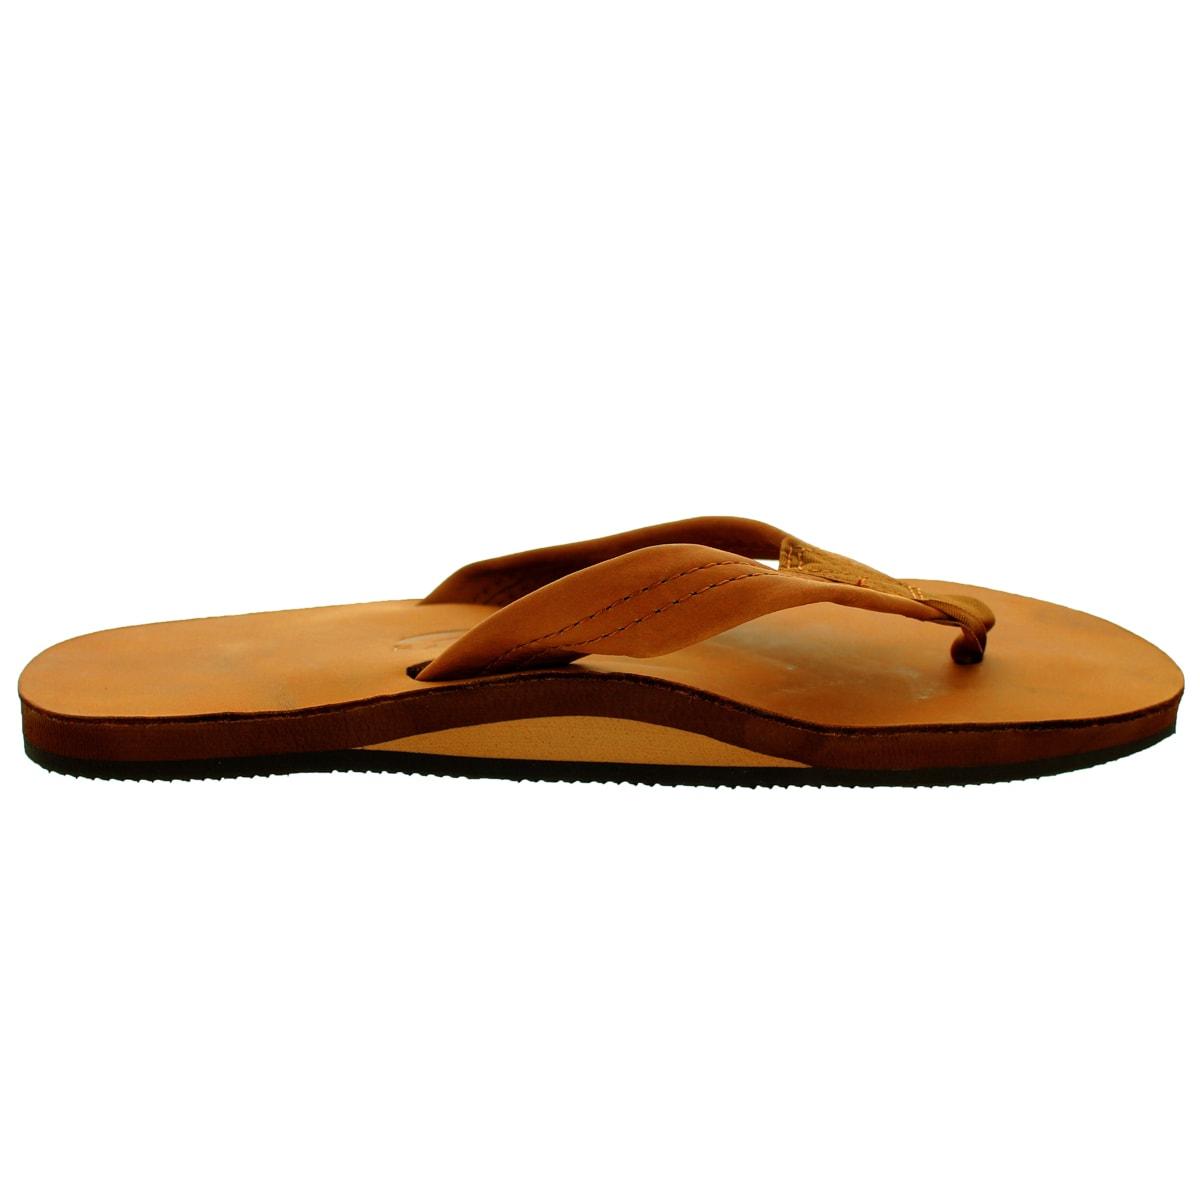 b59050a95143 Shop Rainbow Sandals Men s Single Layer Premier Tt Tan Sandal - Free  Shipping Today - Overstock - 12322170